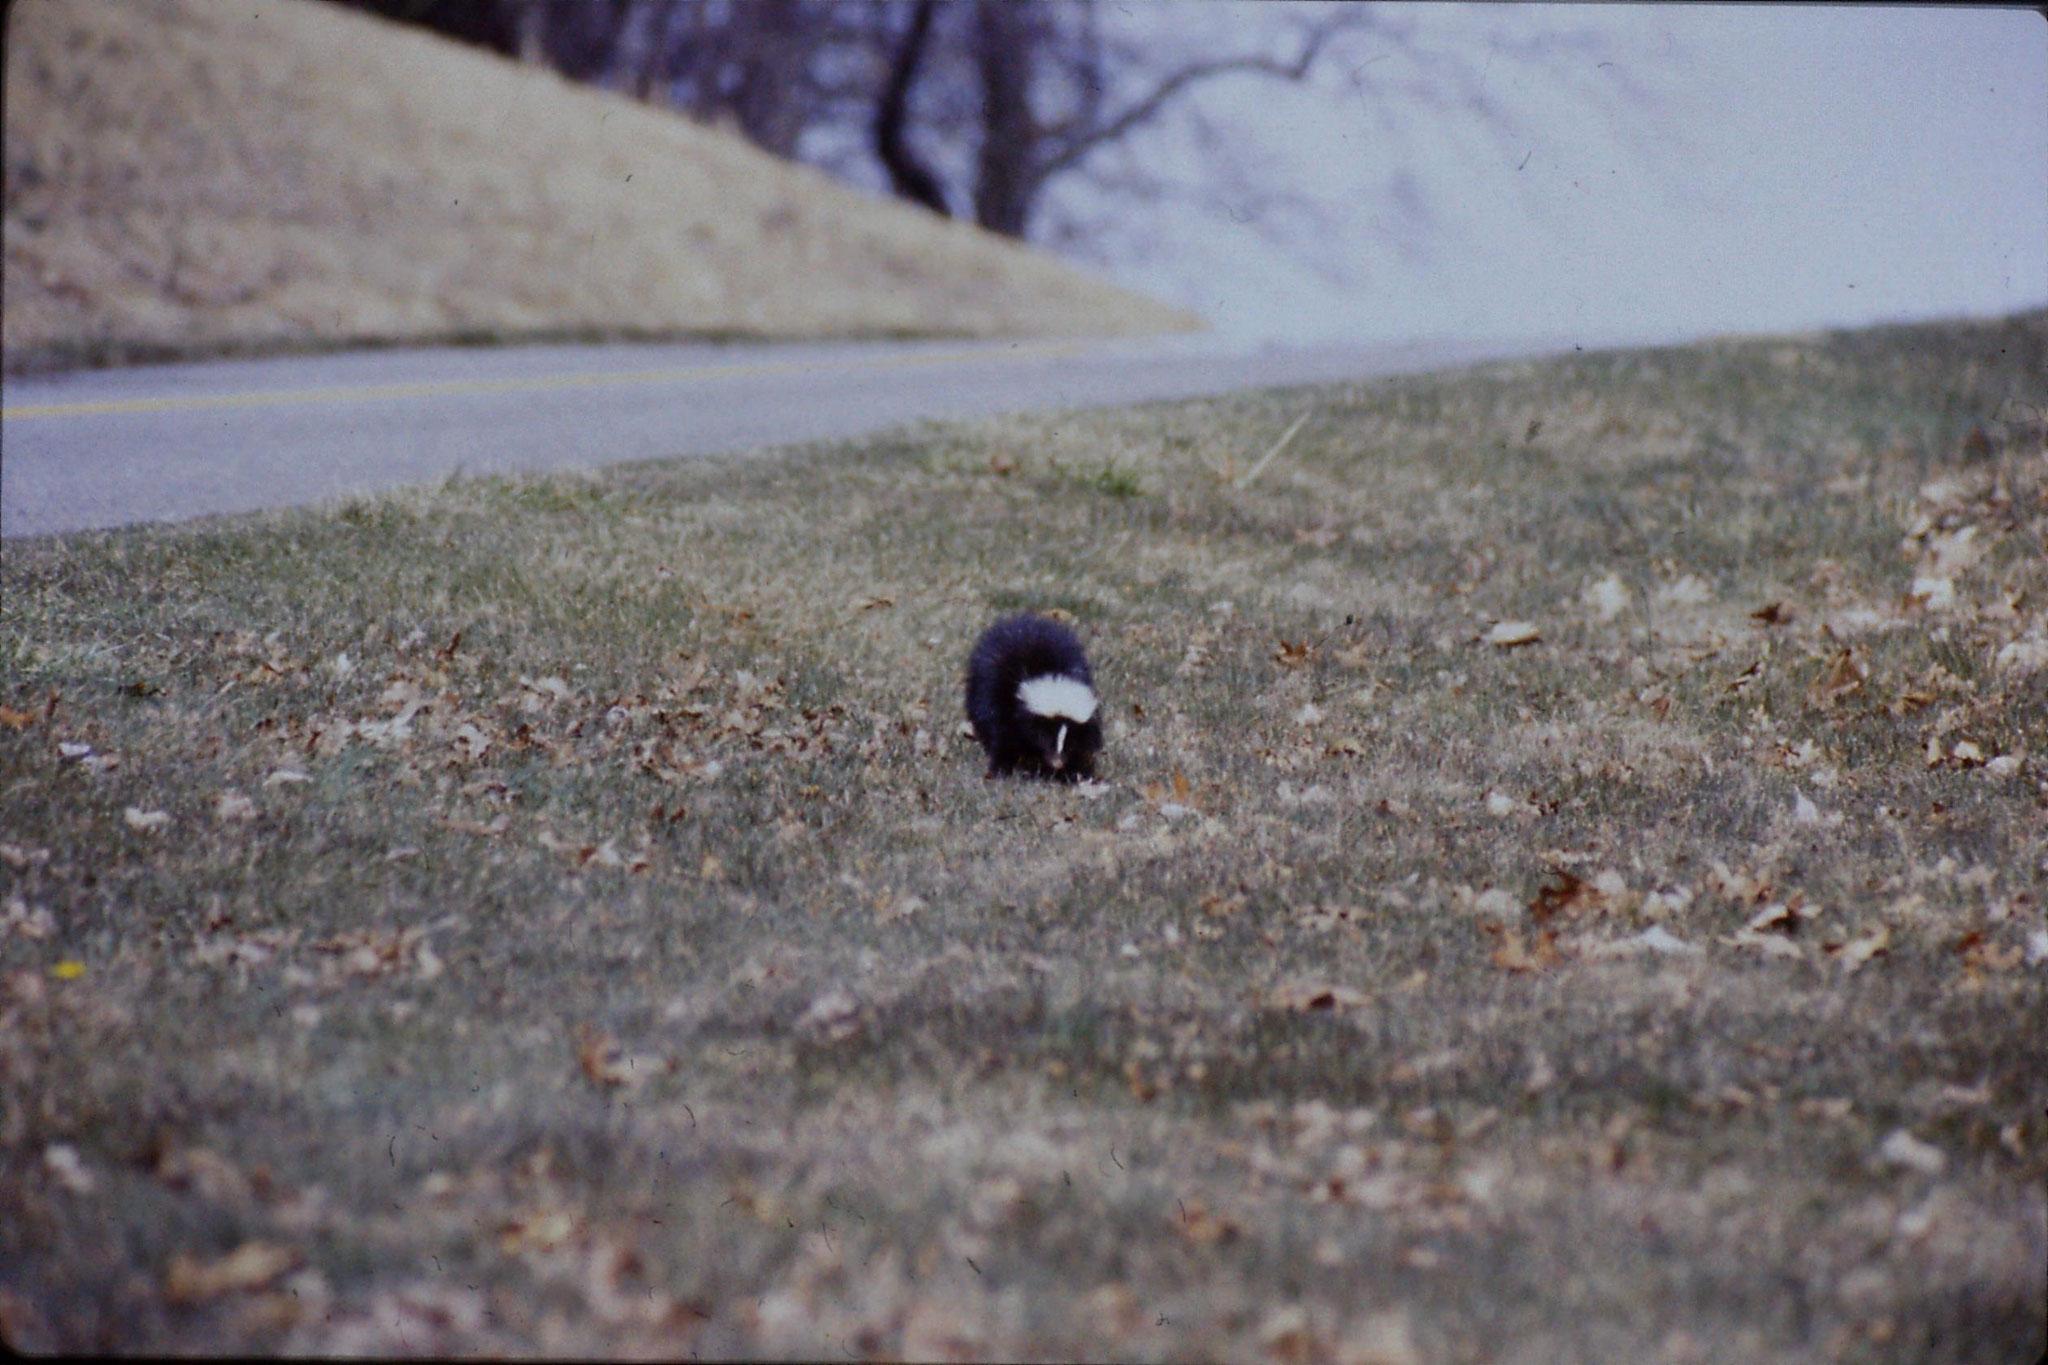 17/3/1991: 25: Benge Gap skunk